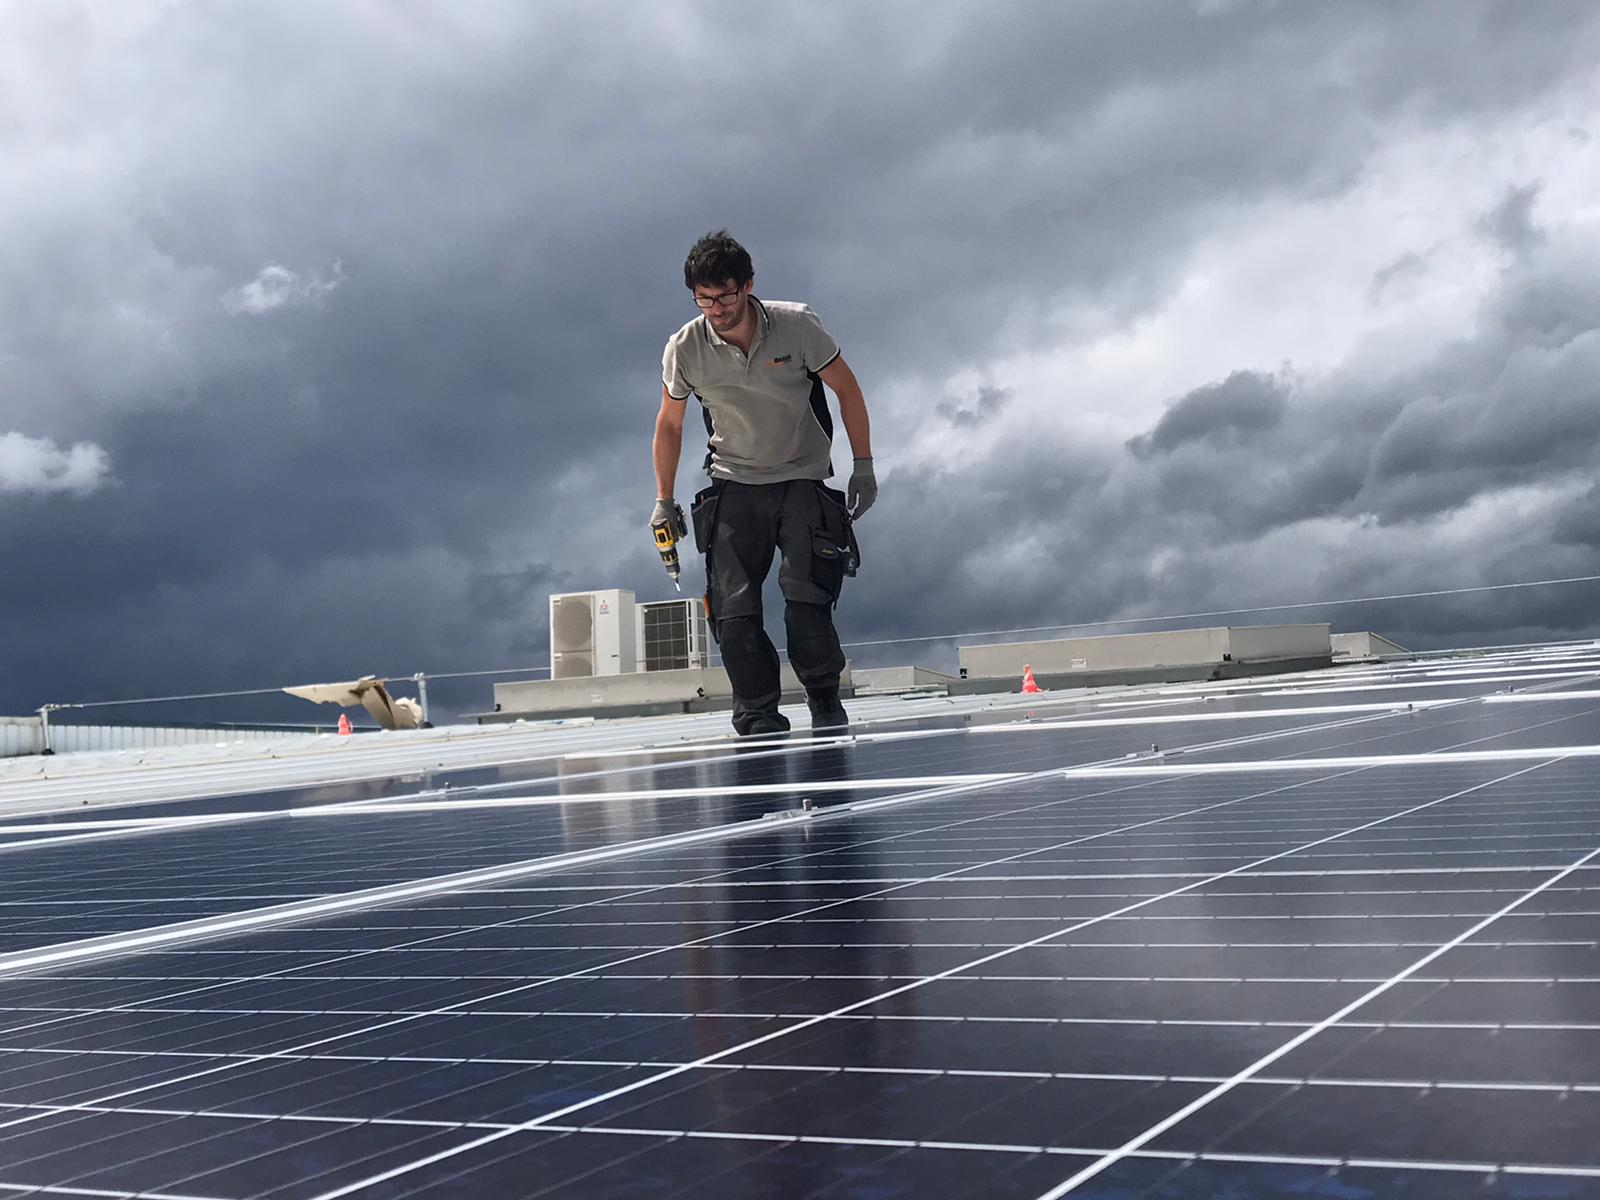 Proyectos e instalacion de placas solares